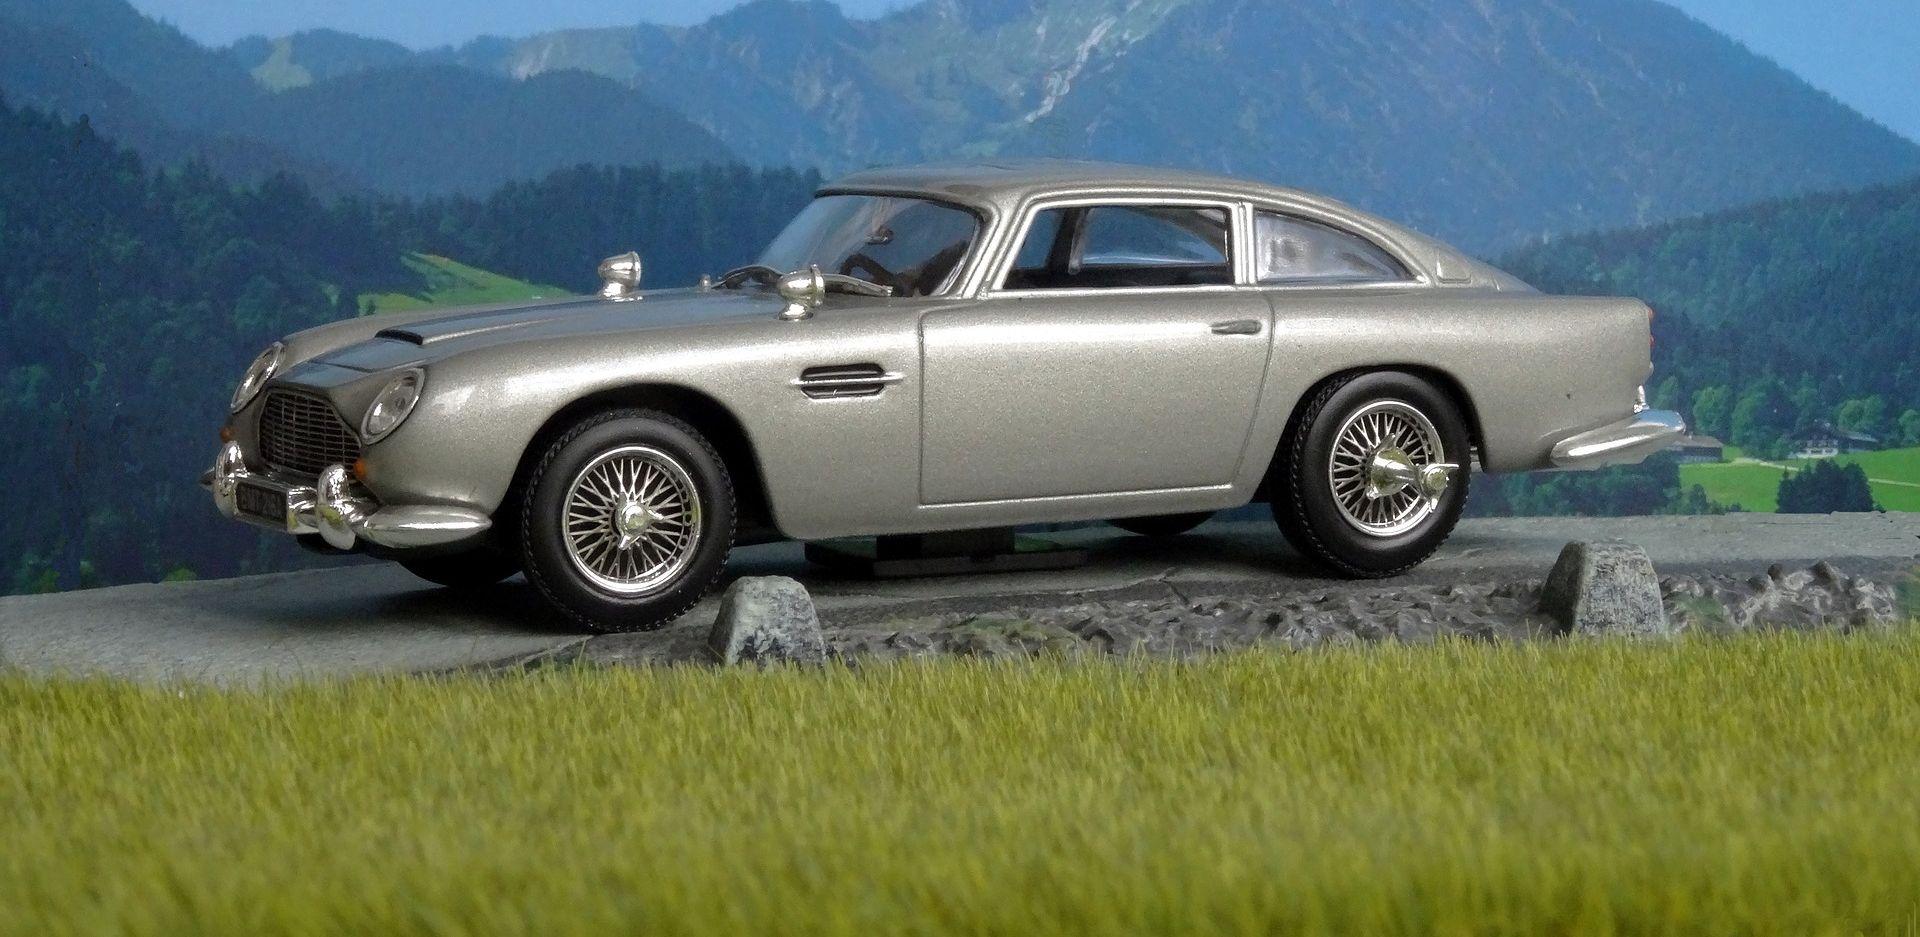 Aston Martin ponovno izrađuje Bondov automobil